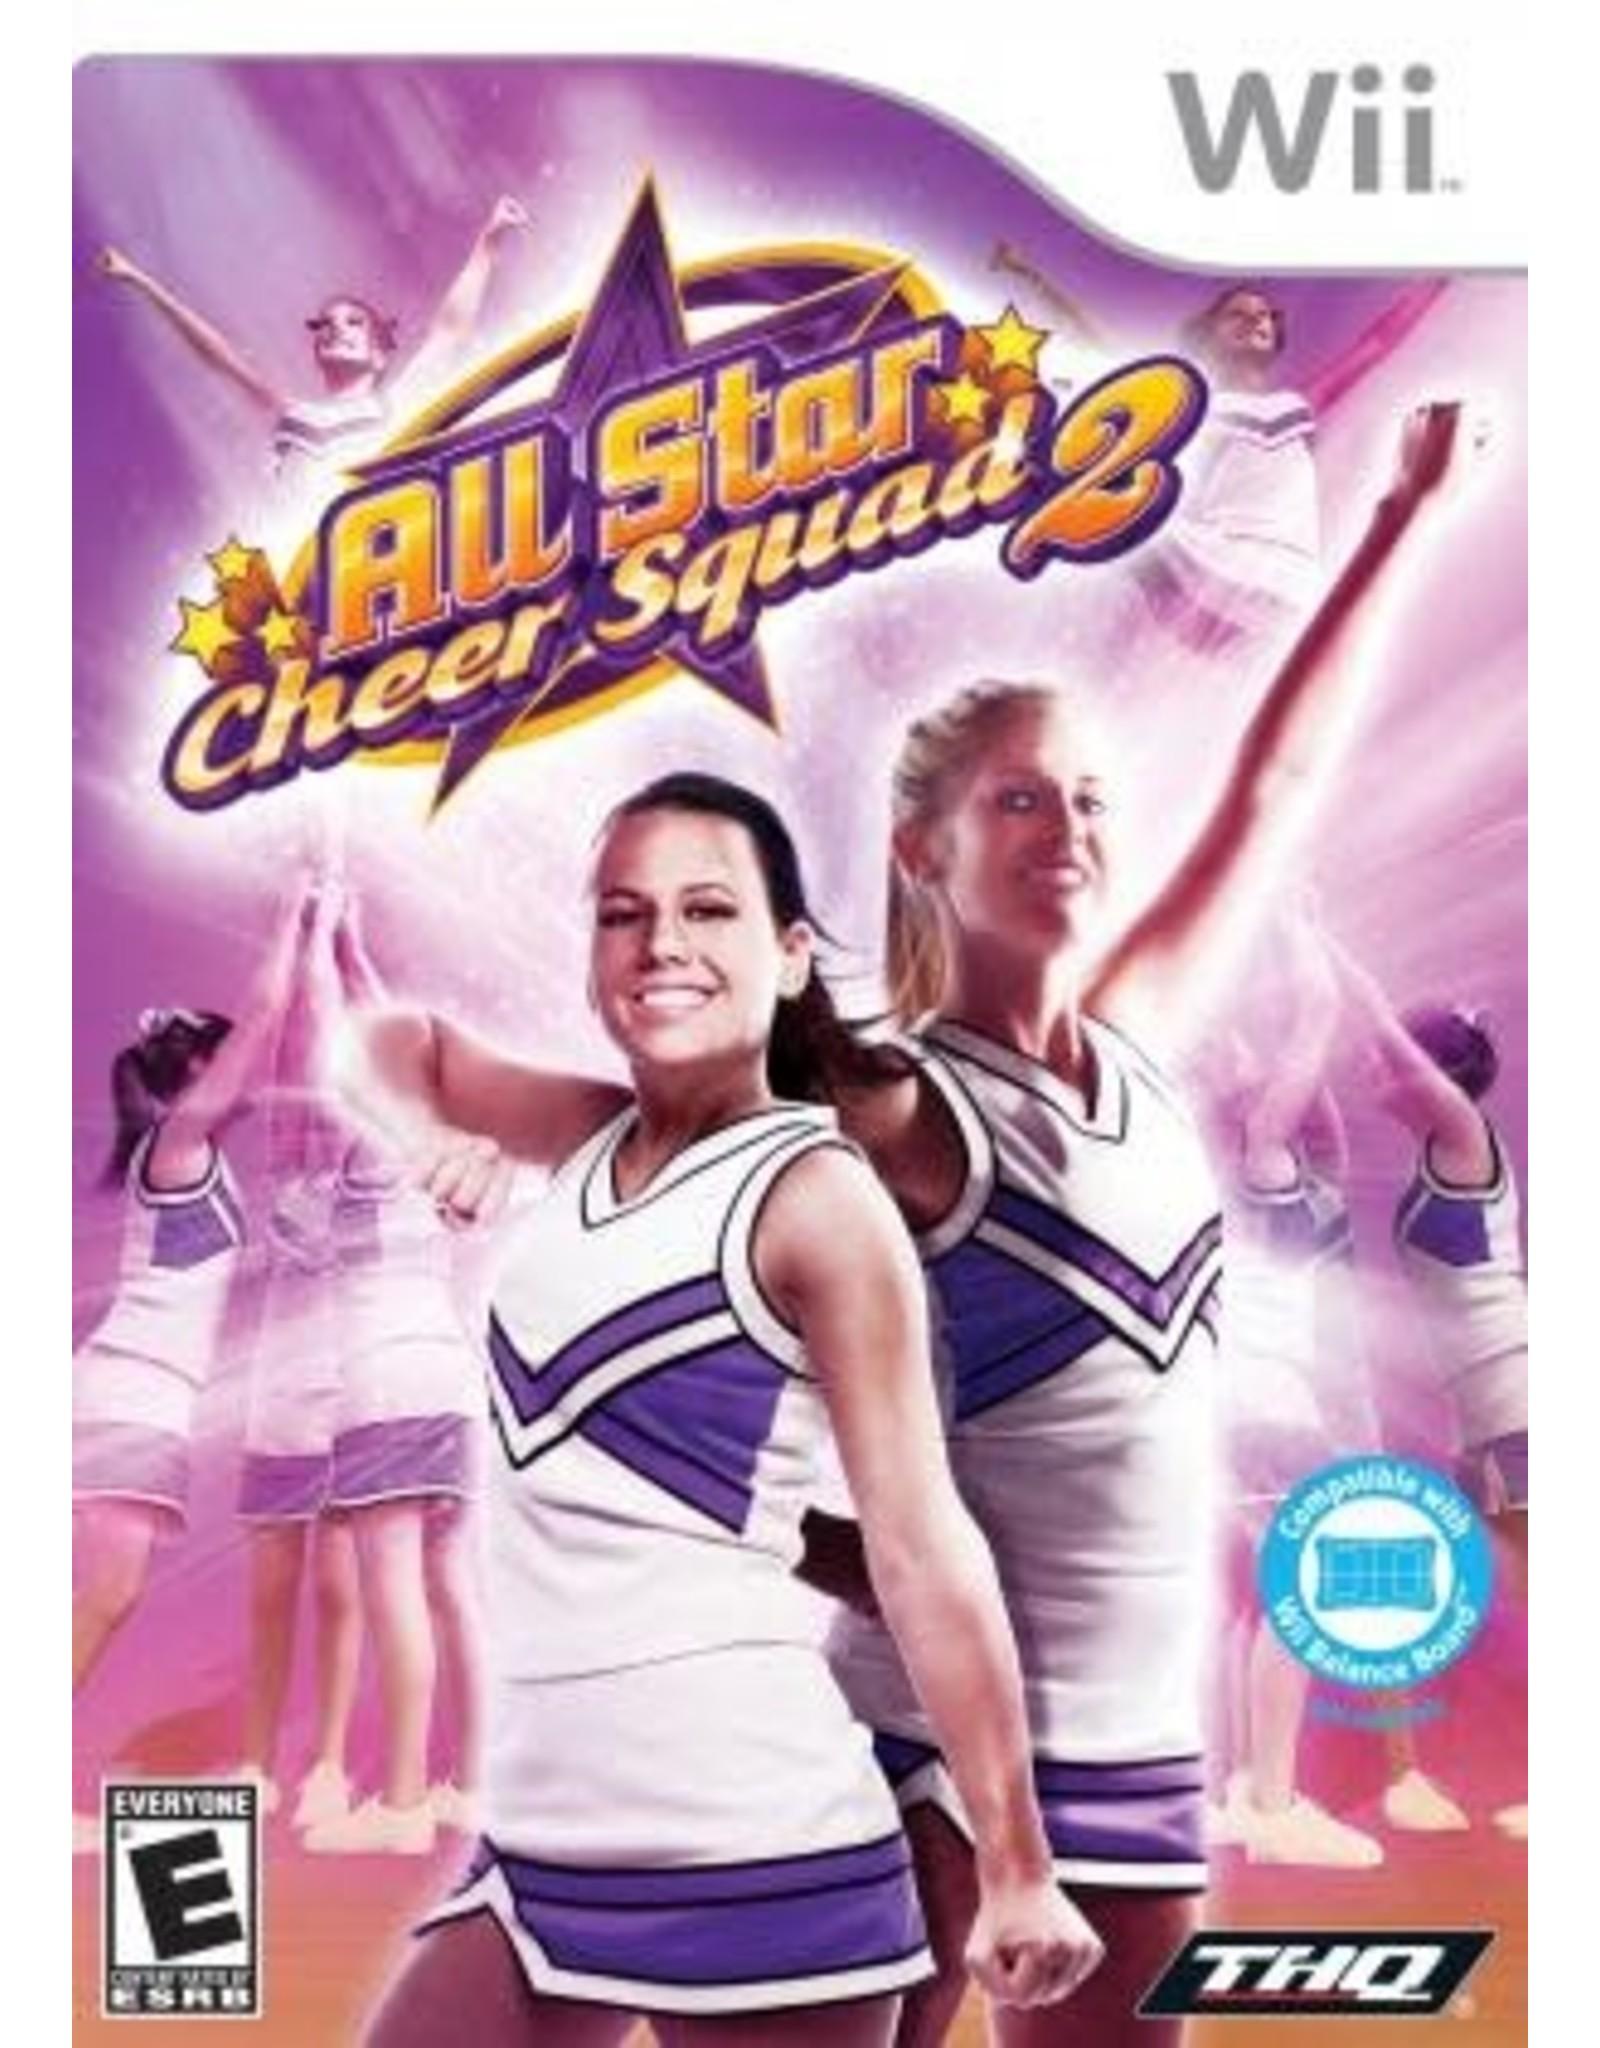 Wii All Star Cheer Squad 2 (CiB)